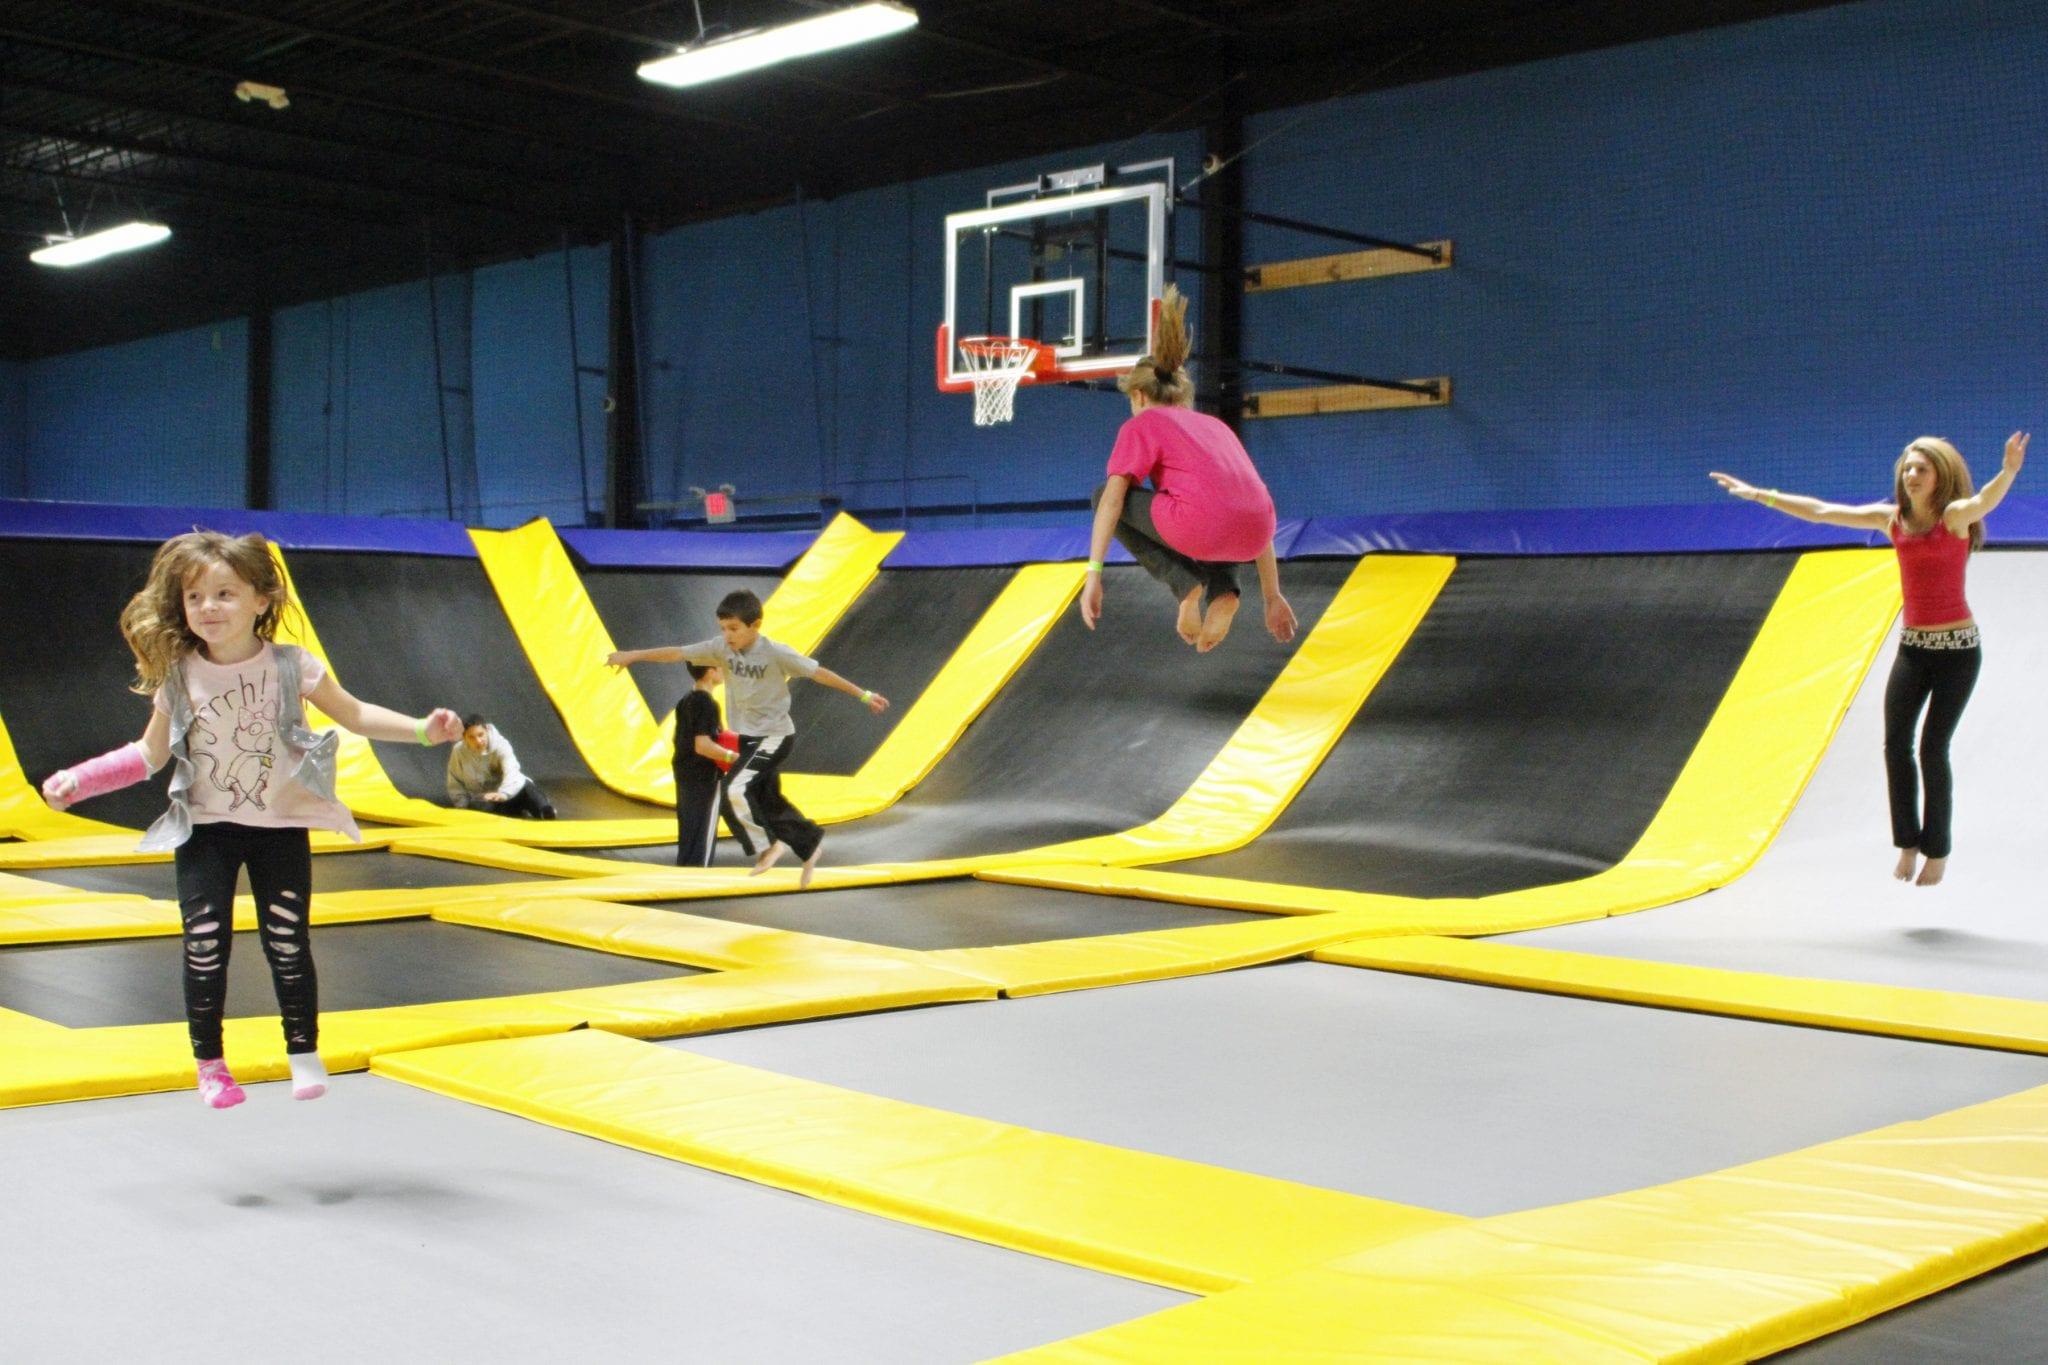 bounce-trampoline-sports-teambuilding-explorewesternmass.com